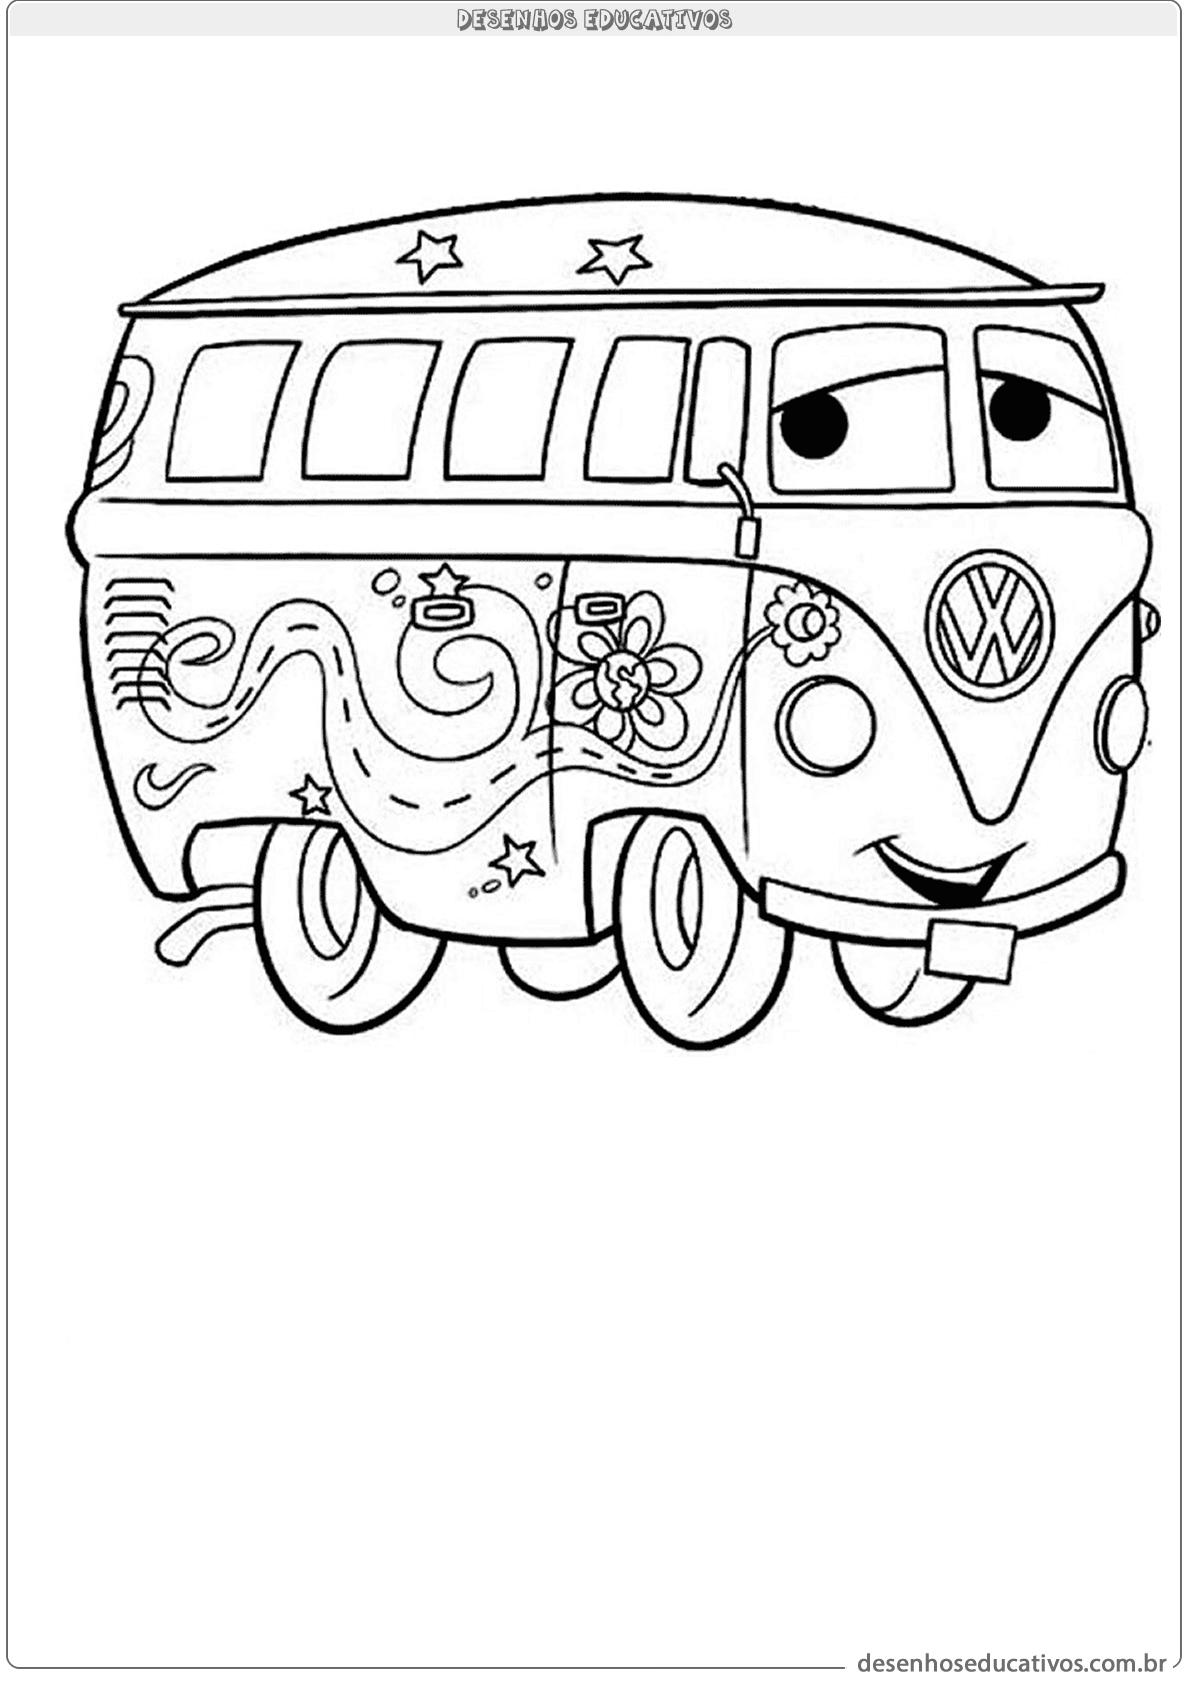 Kombi Para Colorir Desenhos Educativos